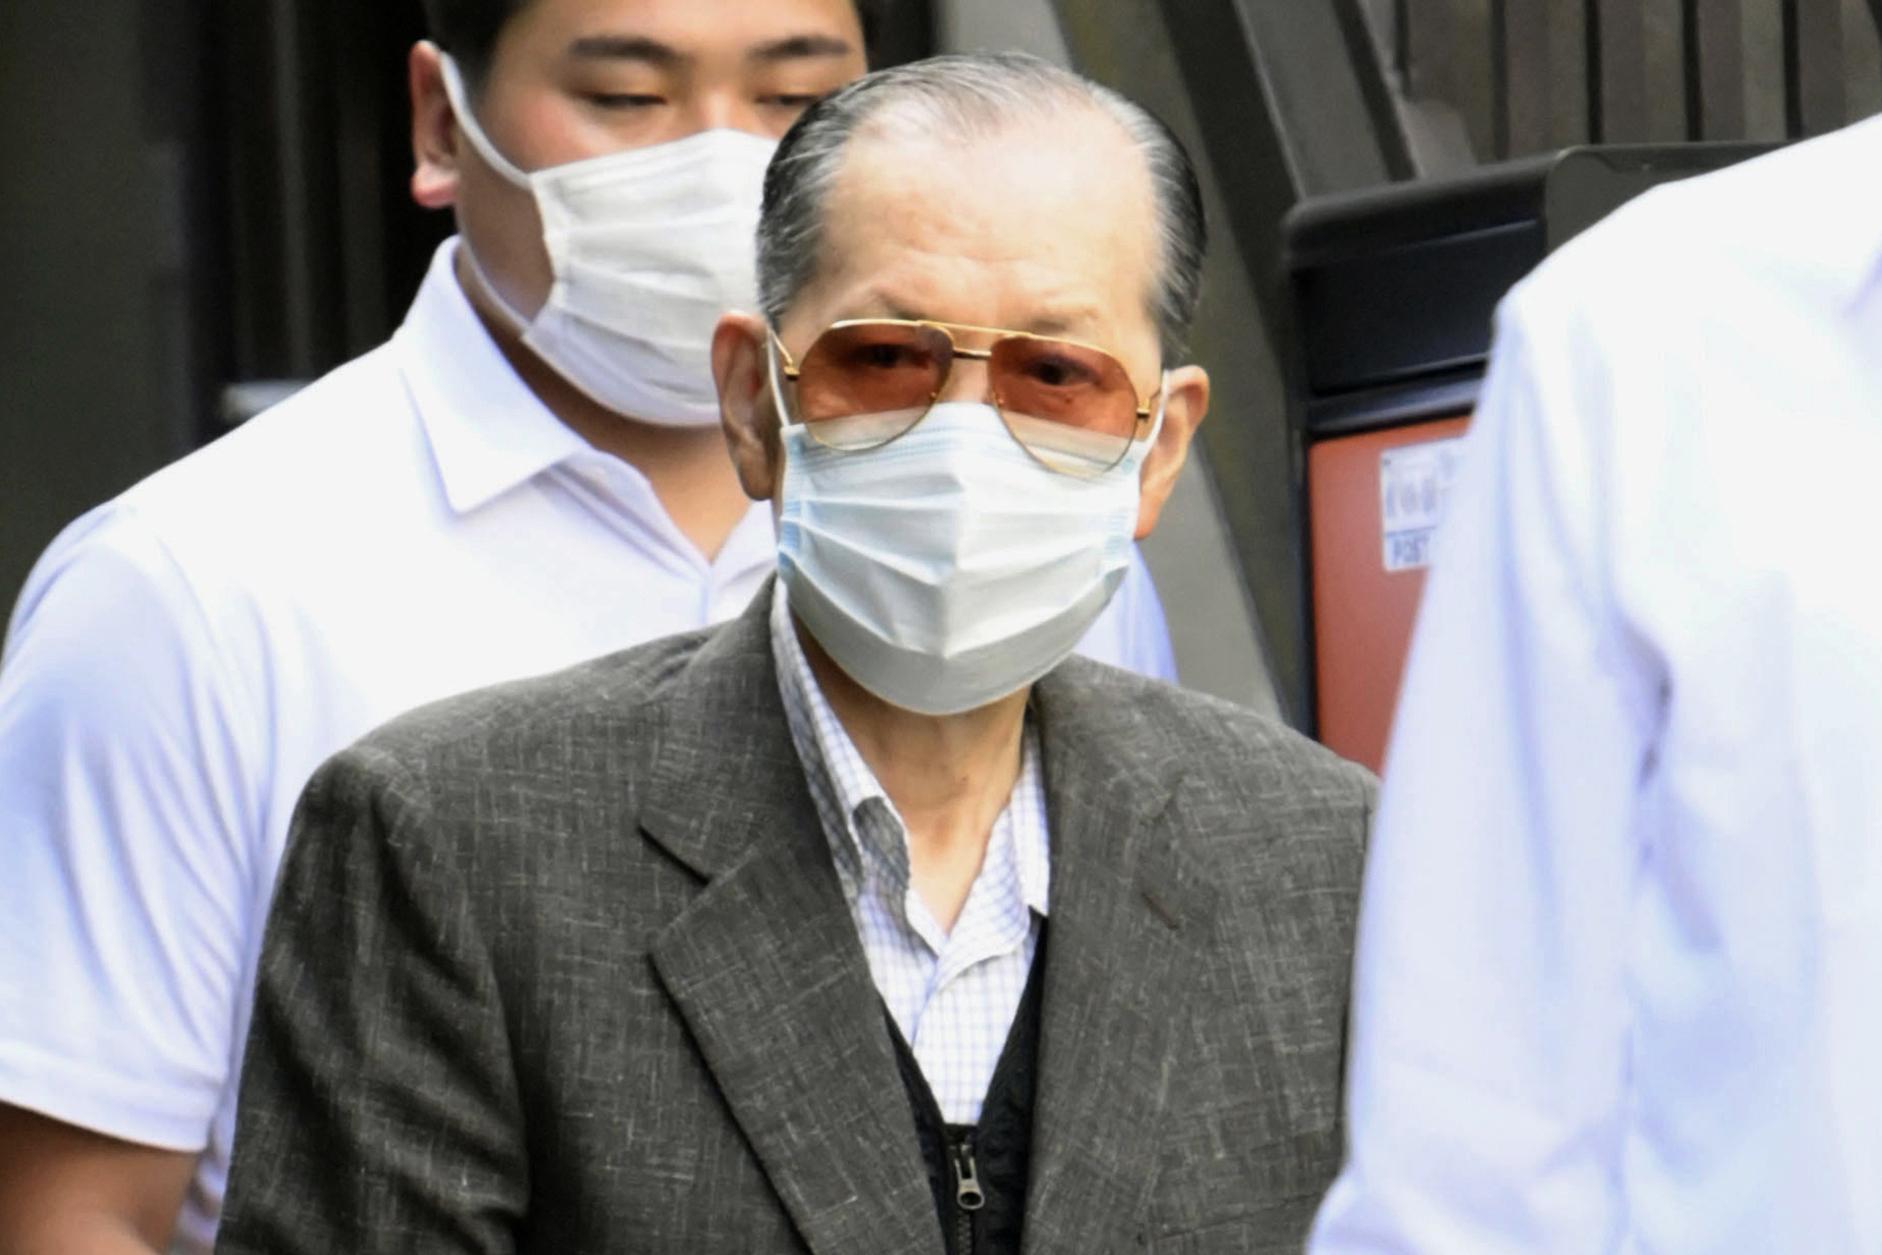 Japan police arrest fraud suspect linked to ex-PMs event